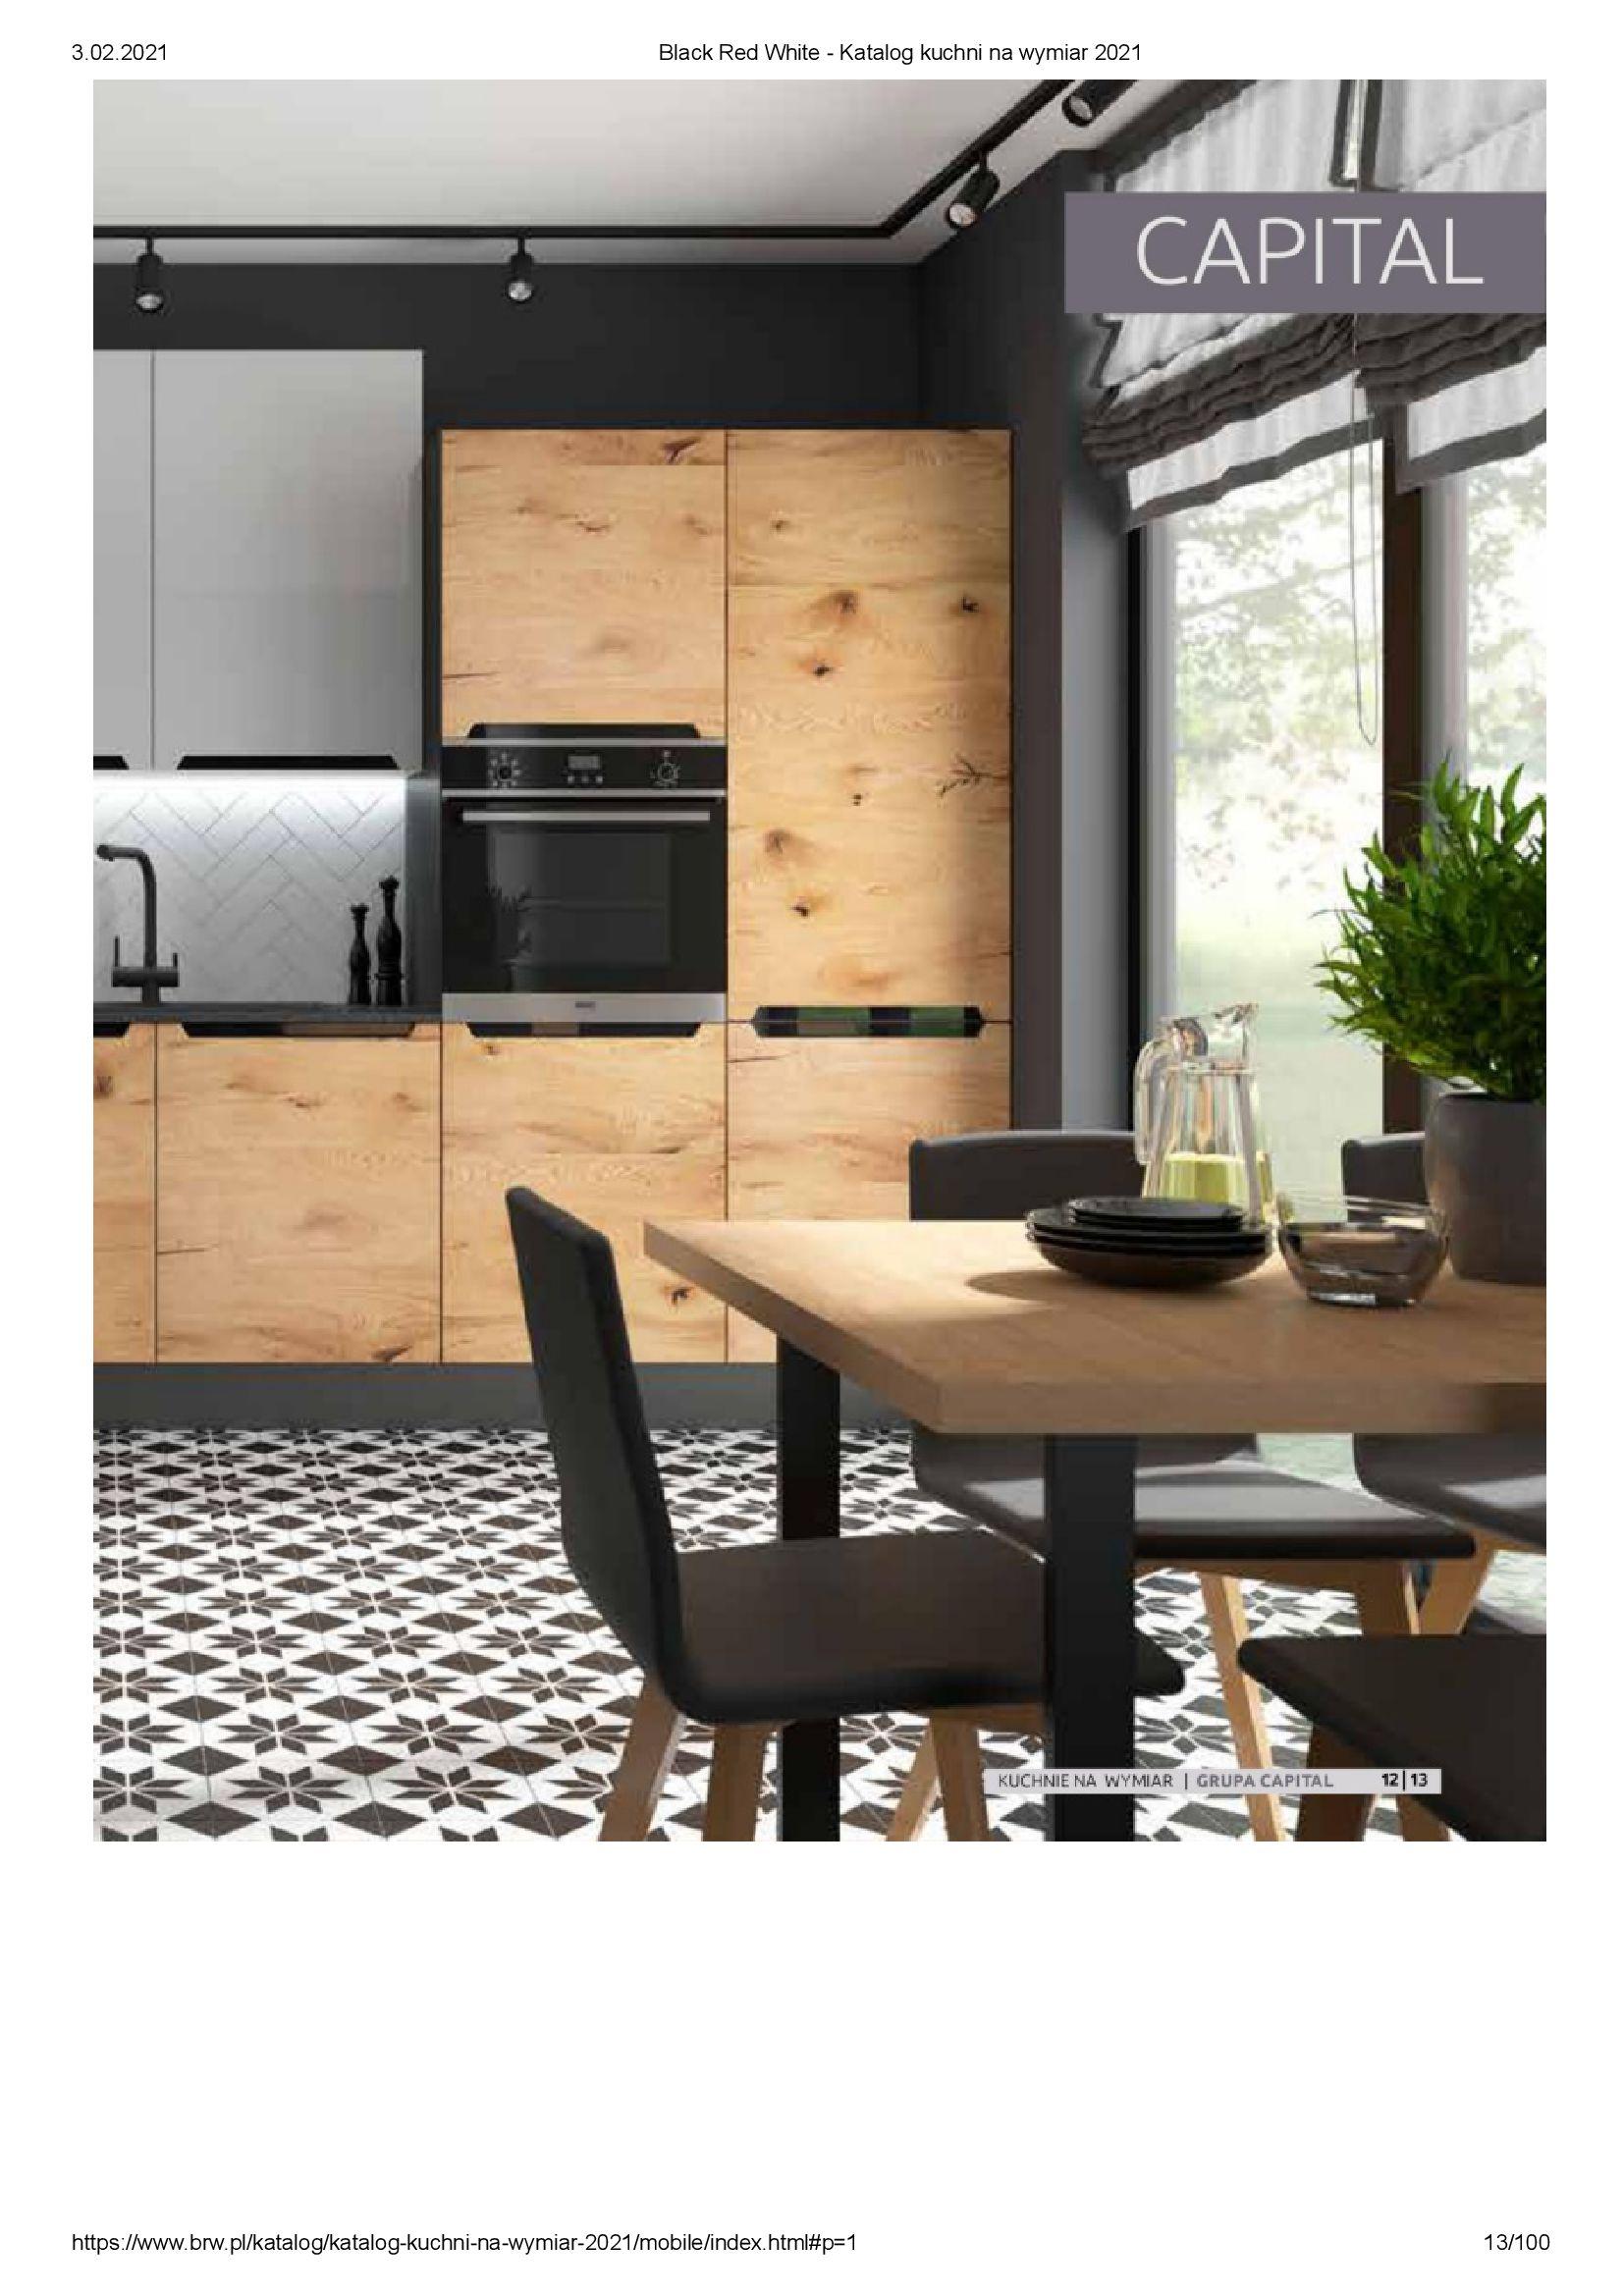 Gazetka Black Red White: Katalog - Kuchnie na wymiar Senso Kitchens 2021 2021-01-01 page-13